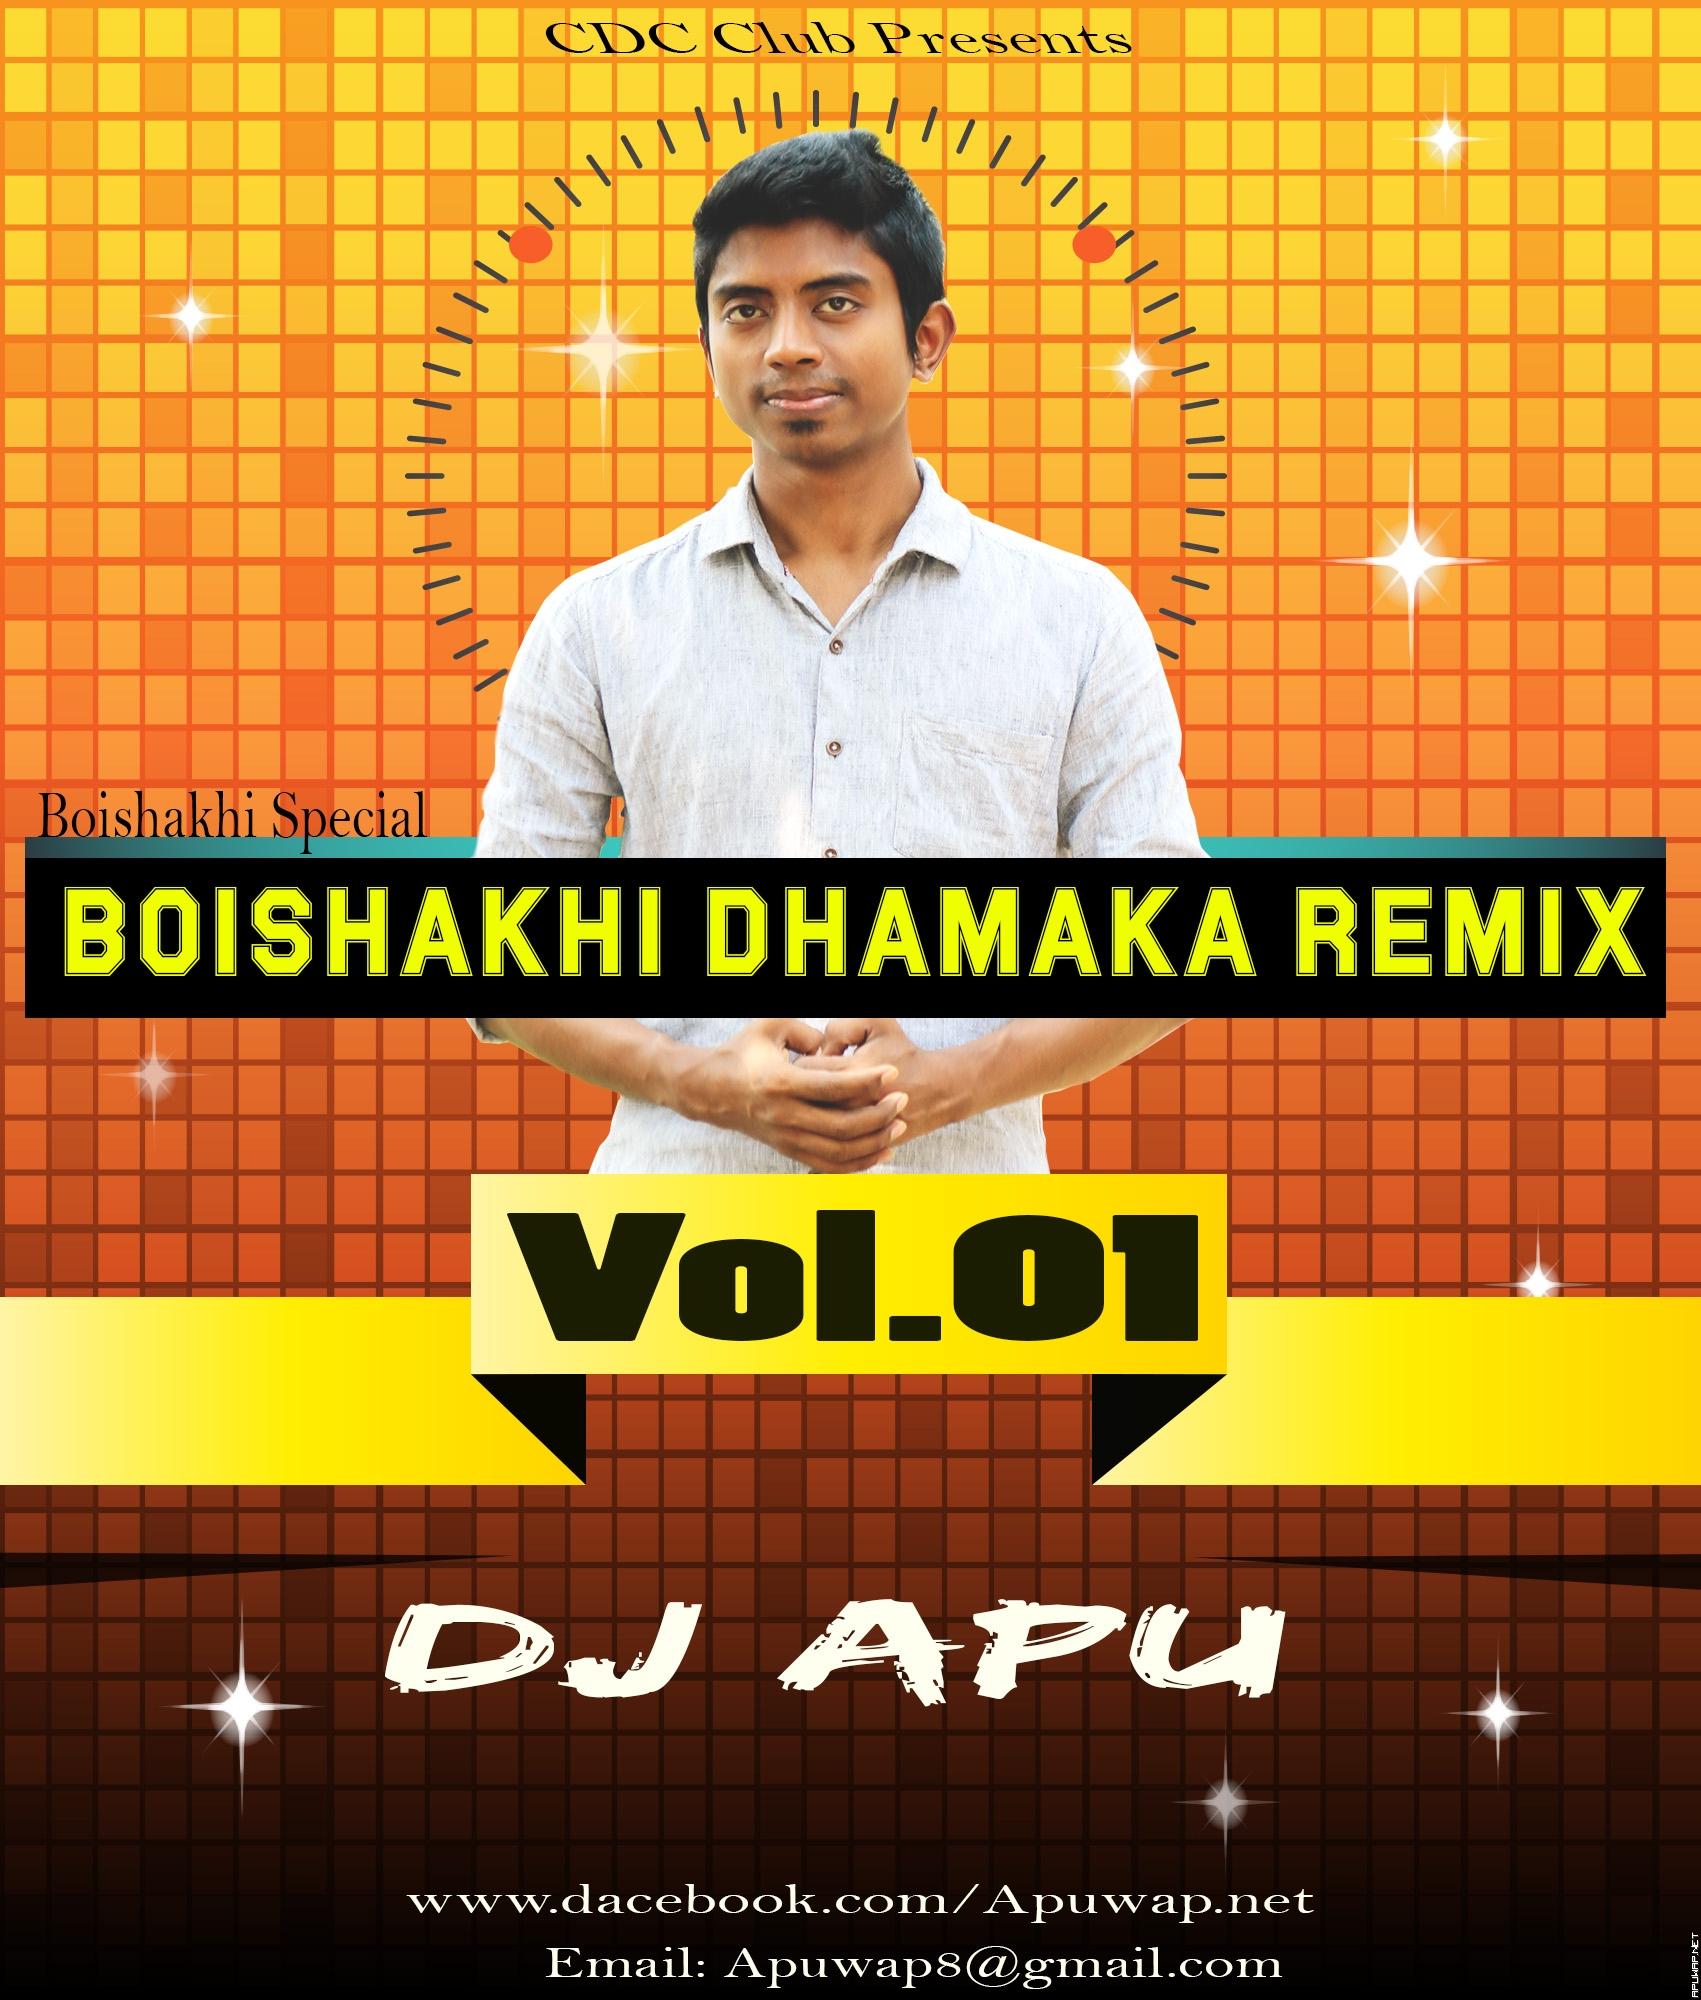 Boishakhi Dhamaka Remix Vol.01 (2018)